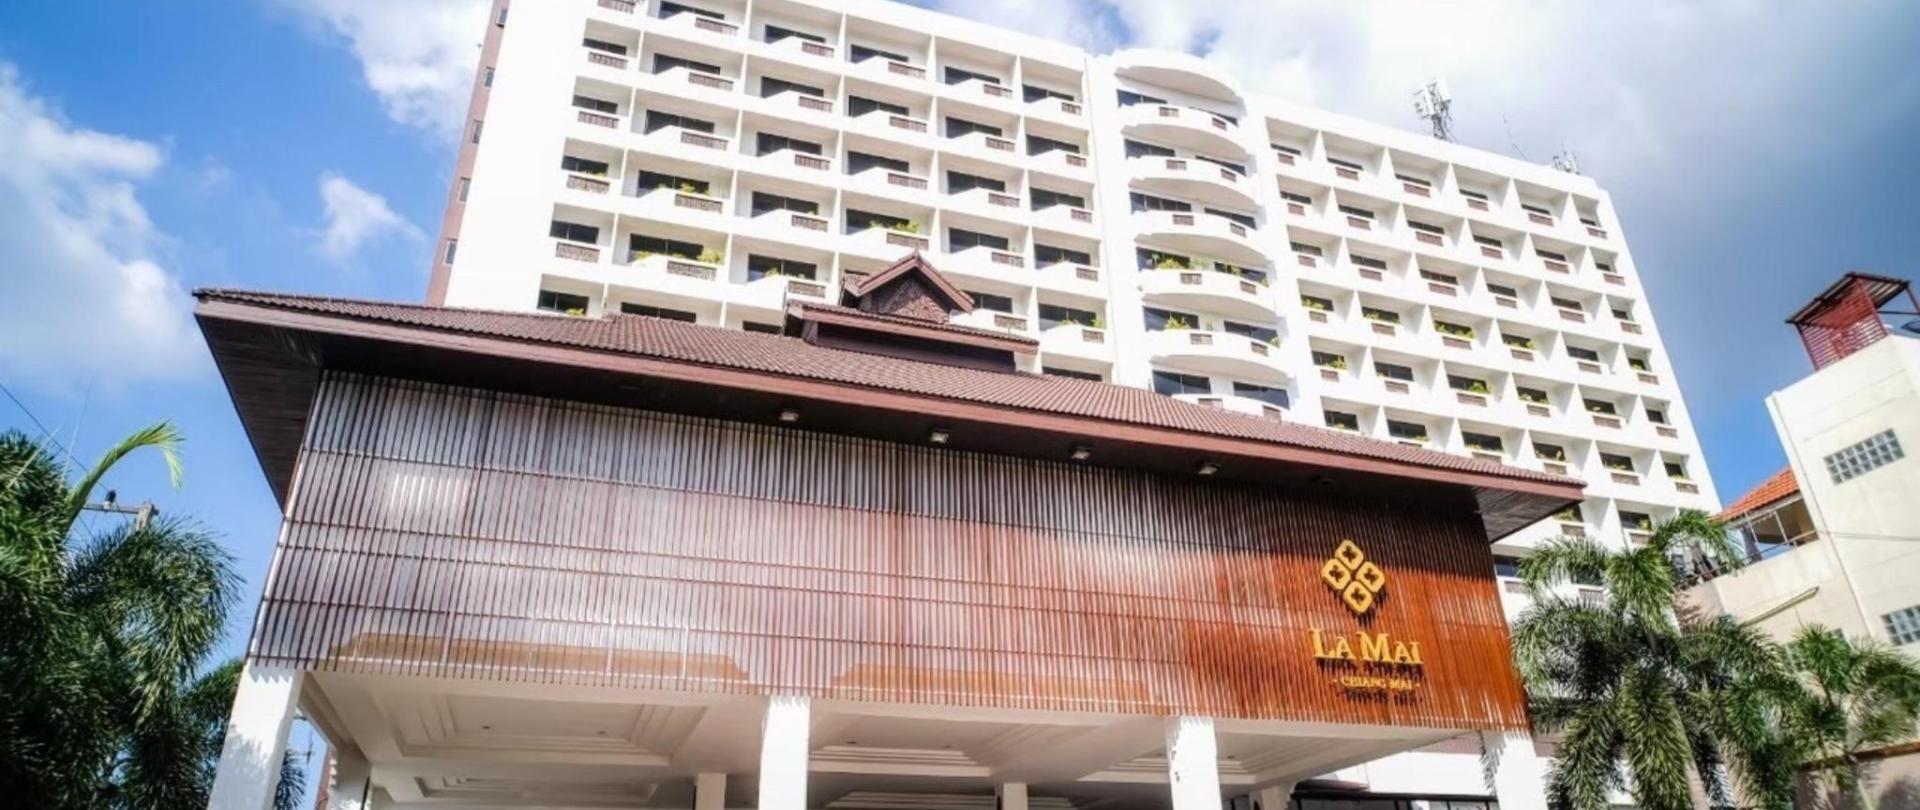 1 Hotel Entrance.jpg